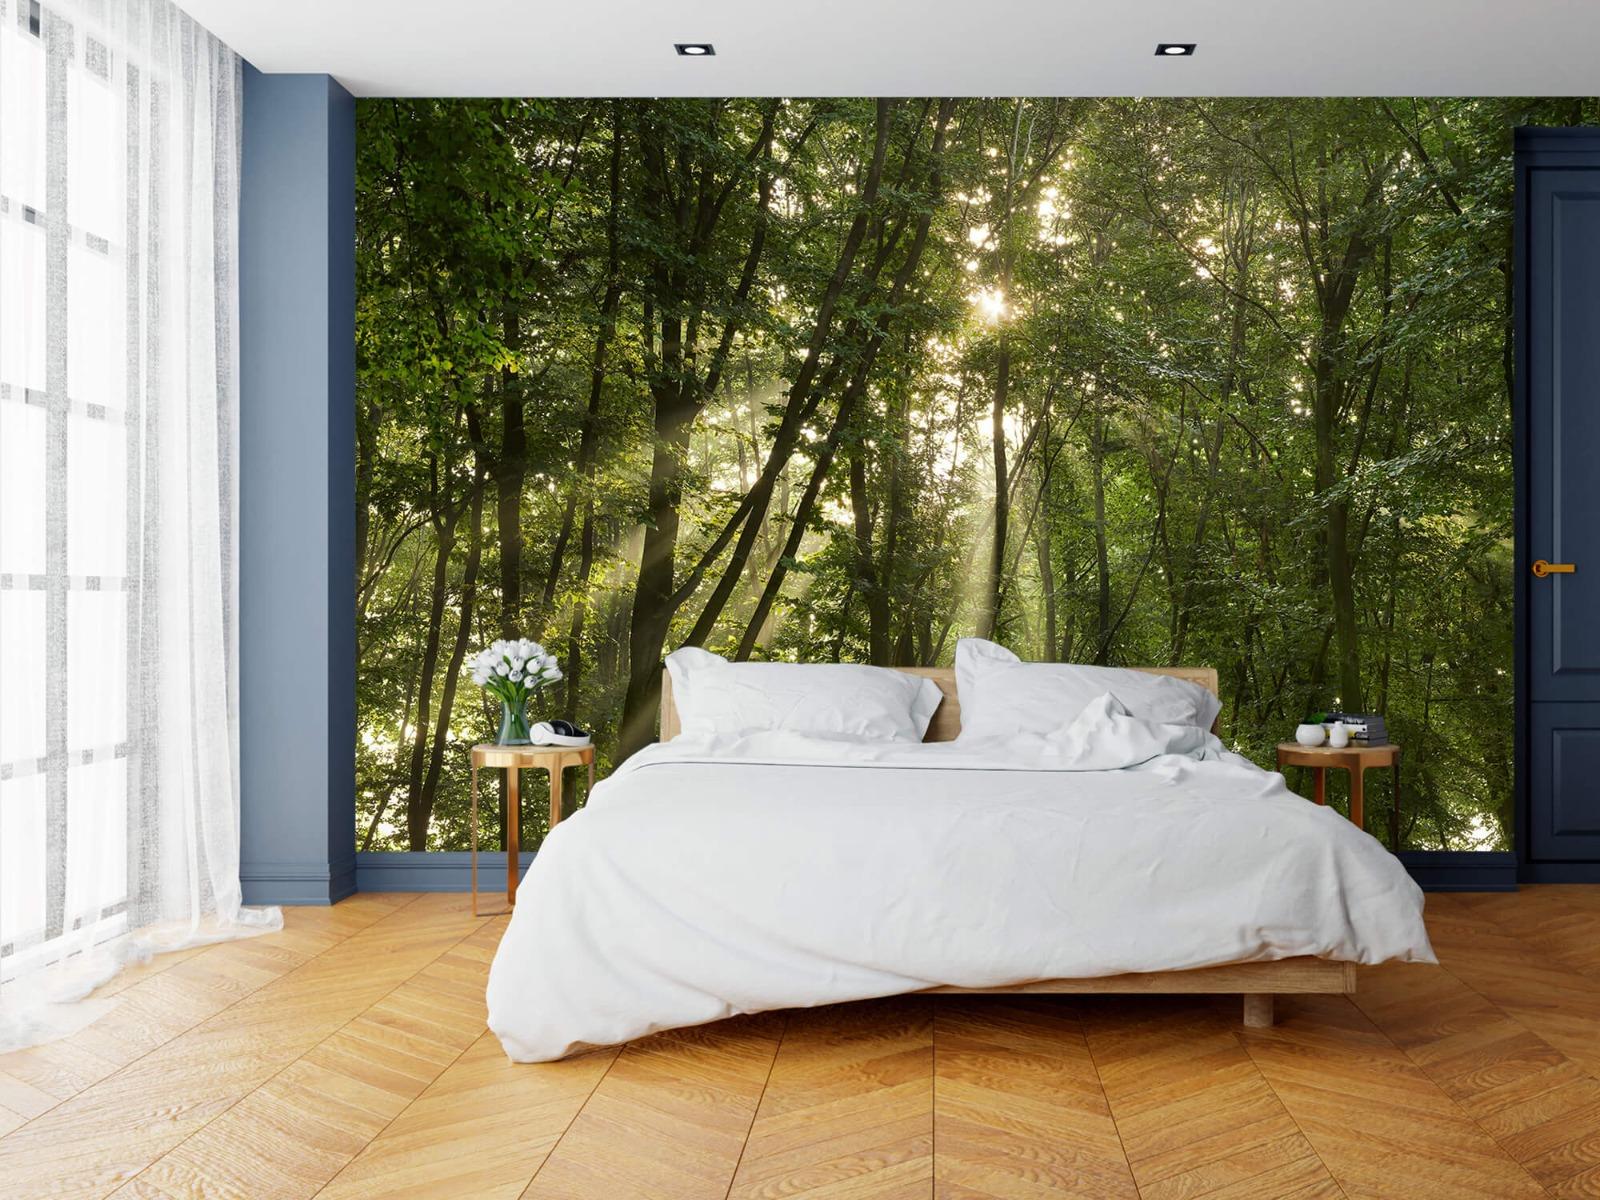 Bomen - Zonnestralen in het bos - Slaapkamer 15